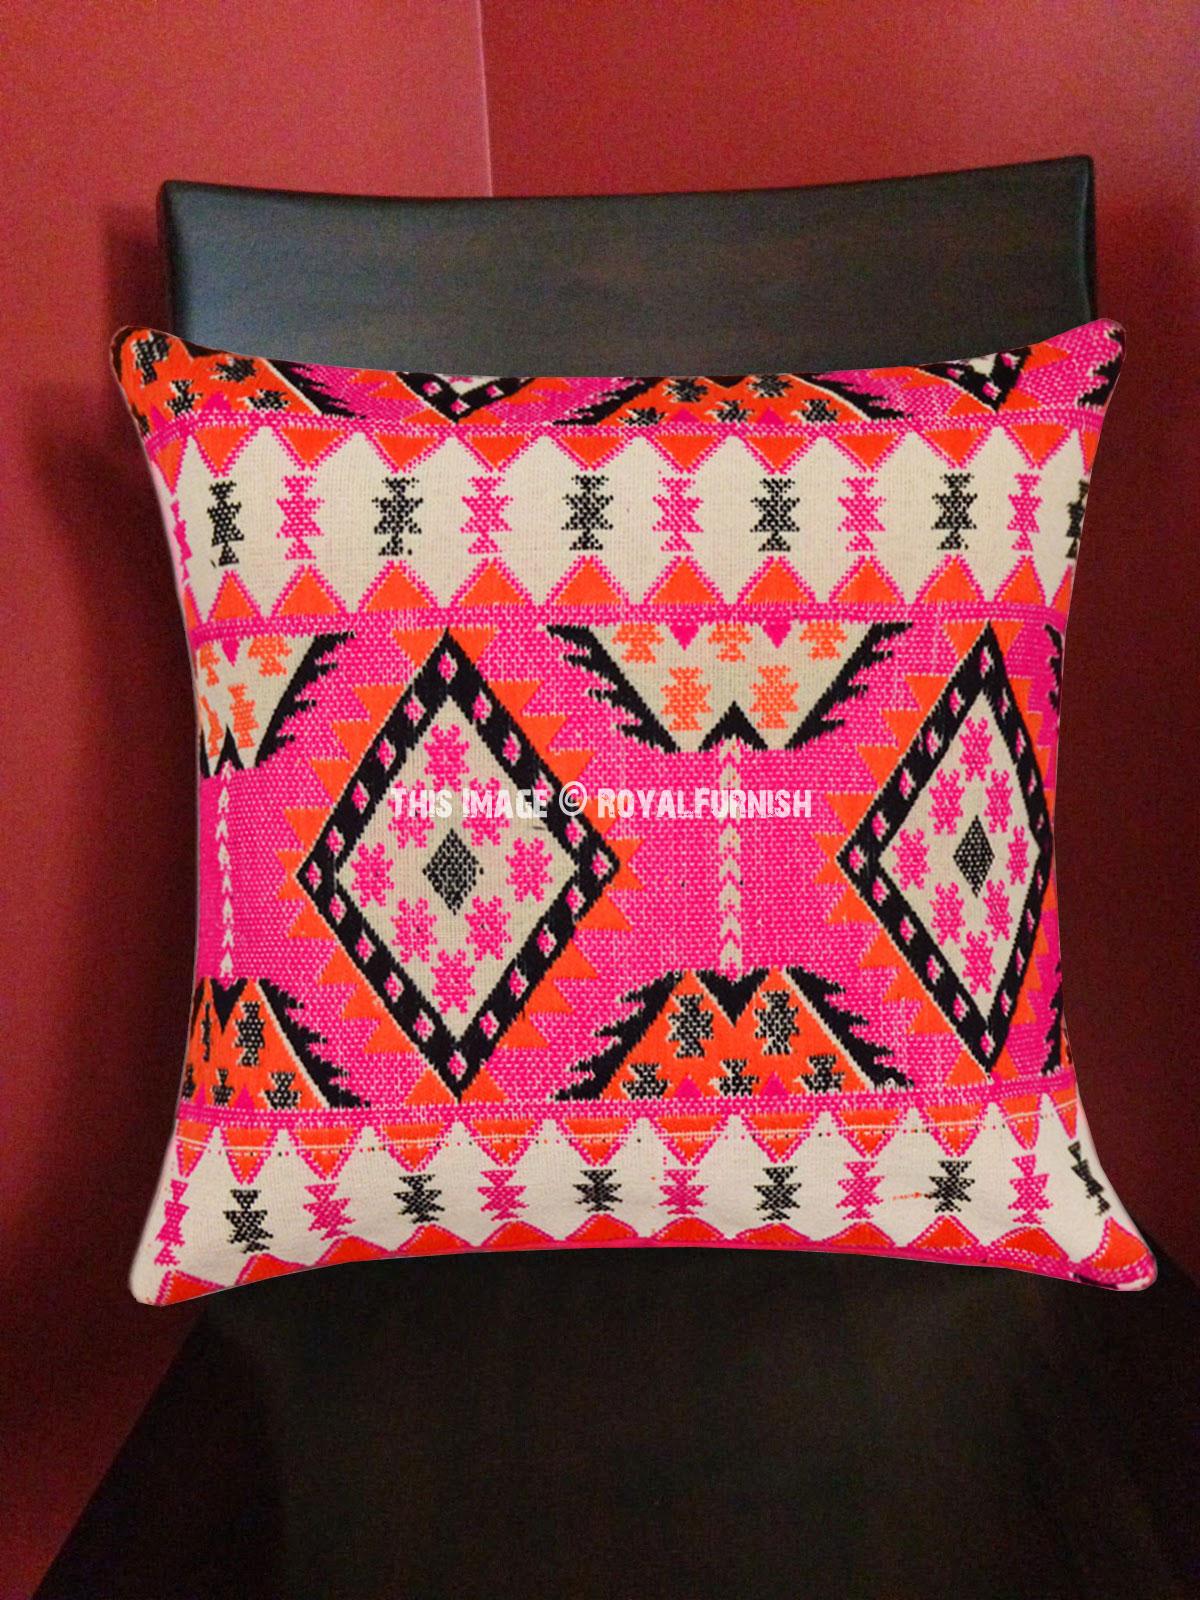 set 3 indian cotton bohemian hippie 16x16 cushion cover zari work pillow cover home decor indian south asian home decor pillows